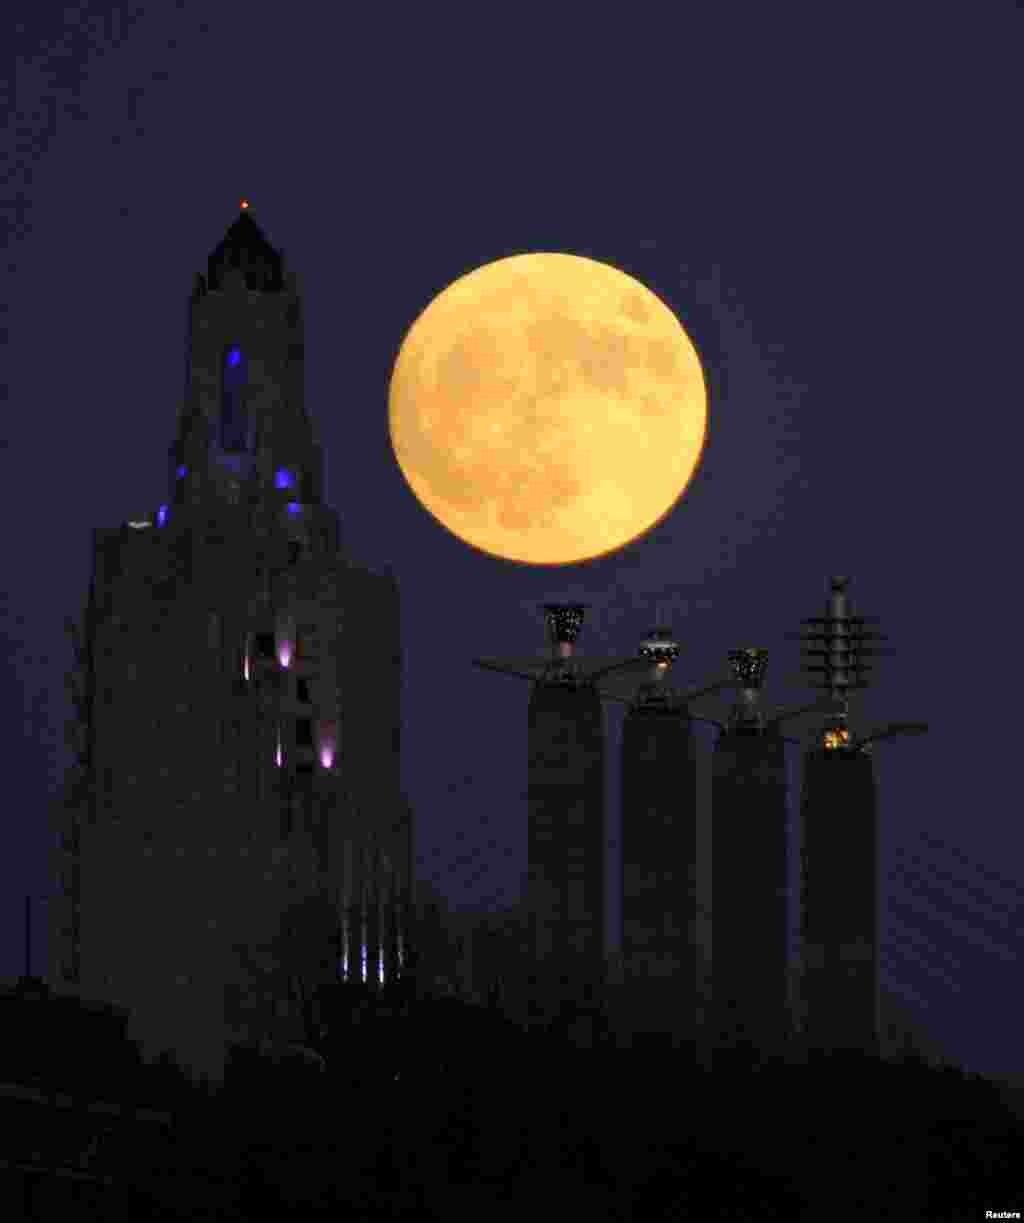 «Суперлуние» восходит в центре Канзас-сити, американский штат Миссури.